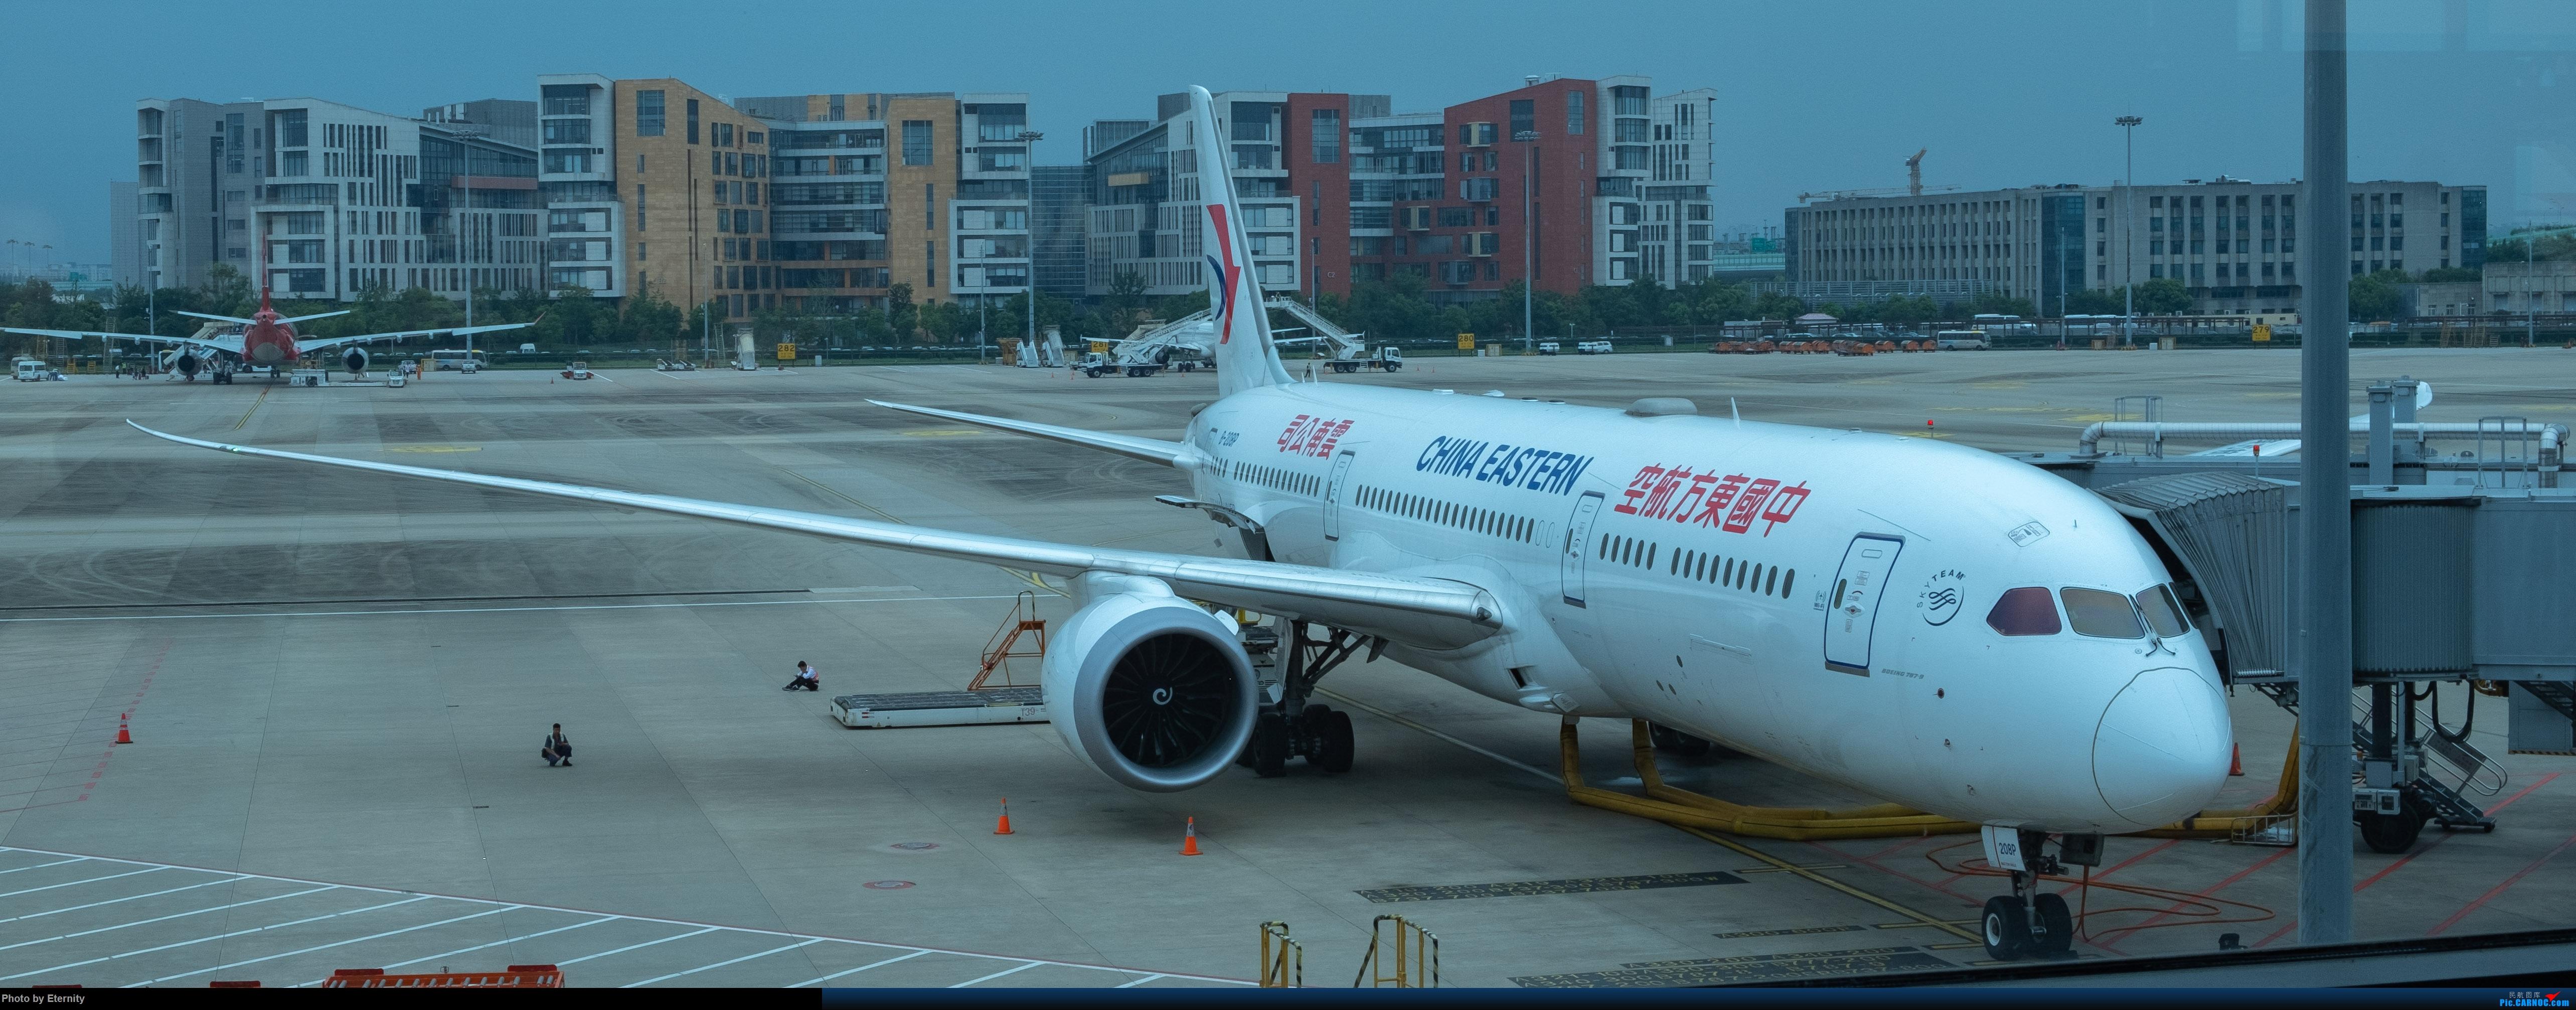 Re:[原创]后疫情期间的暑假国内游 | 西安-上海-广州-成都 | 体验国内3条干线 | 吉祥航空787 | 南航350 | 海航737 BOEING 787-9 B-208P 中国上海虹桥国际机场